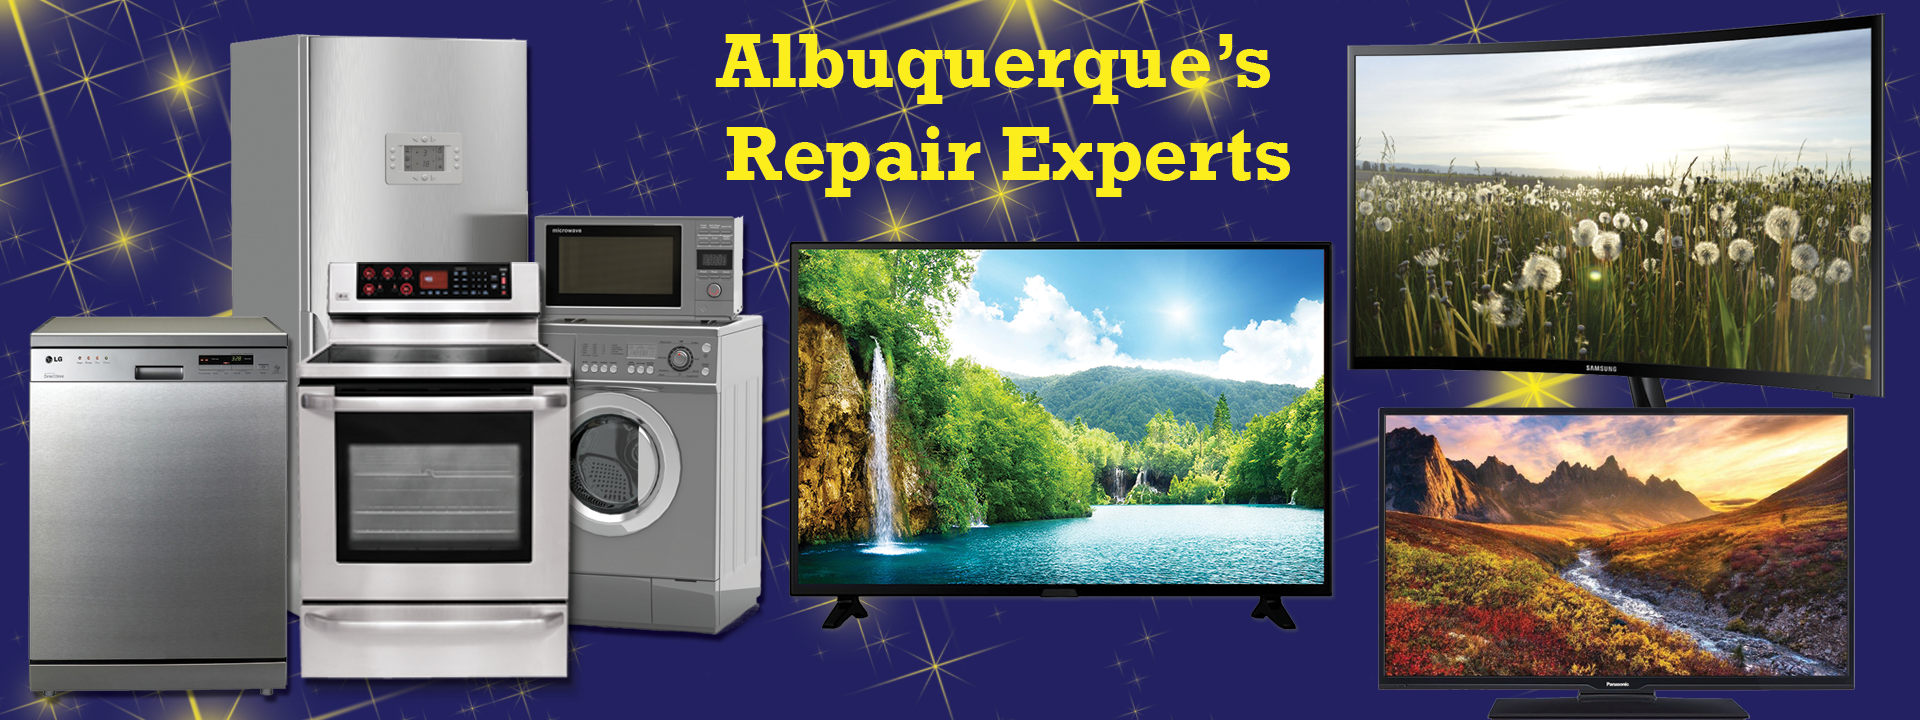 appliance and television repair in Albuquerque, NM